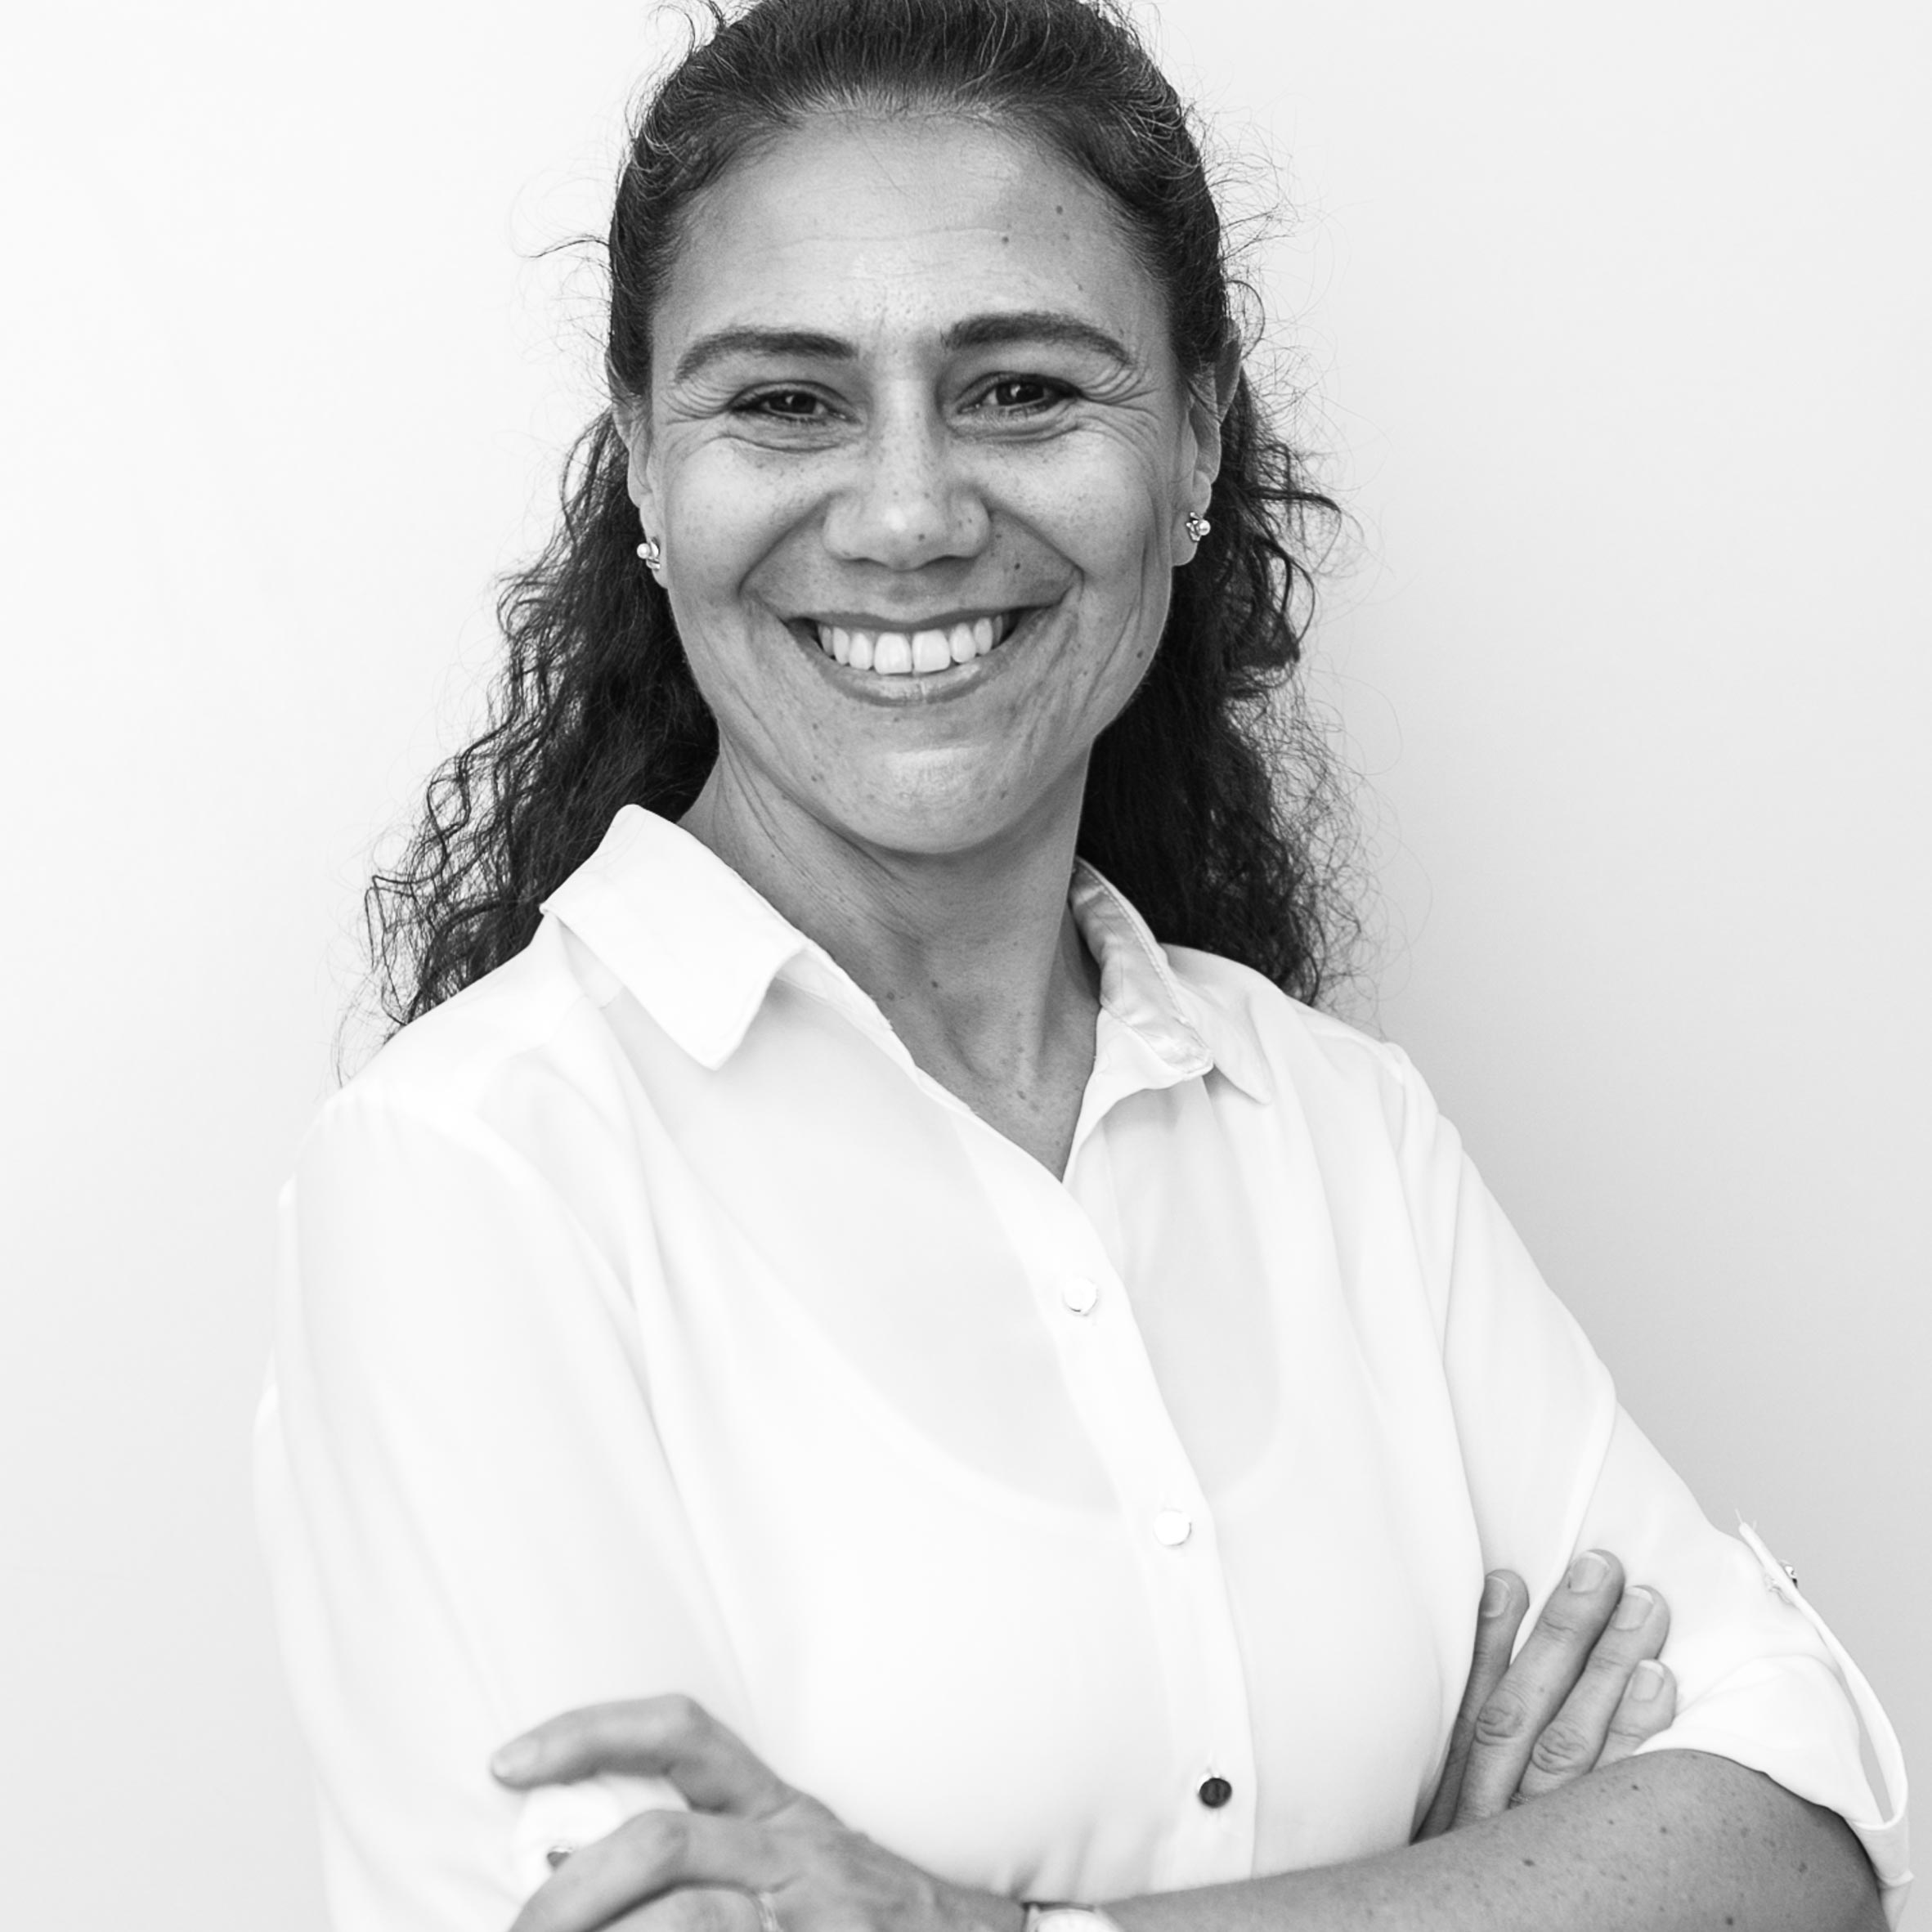 Márcia Elisa Vial